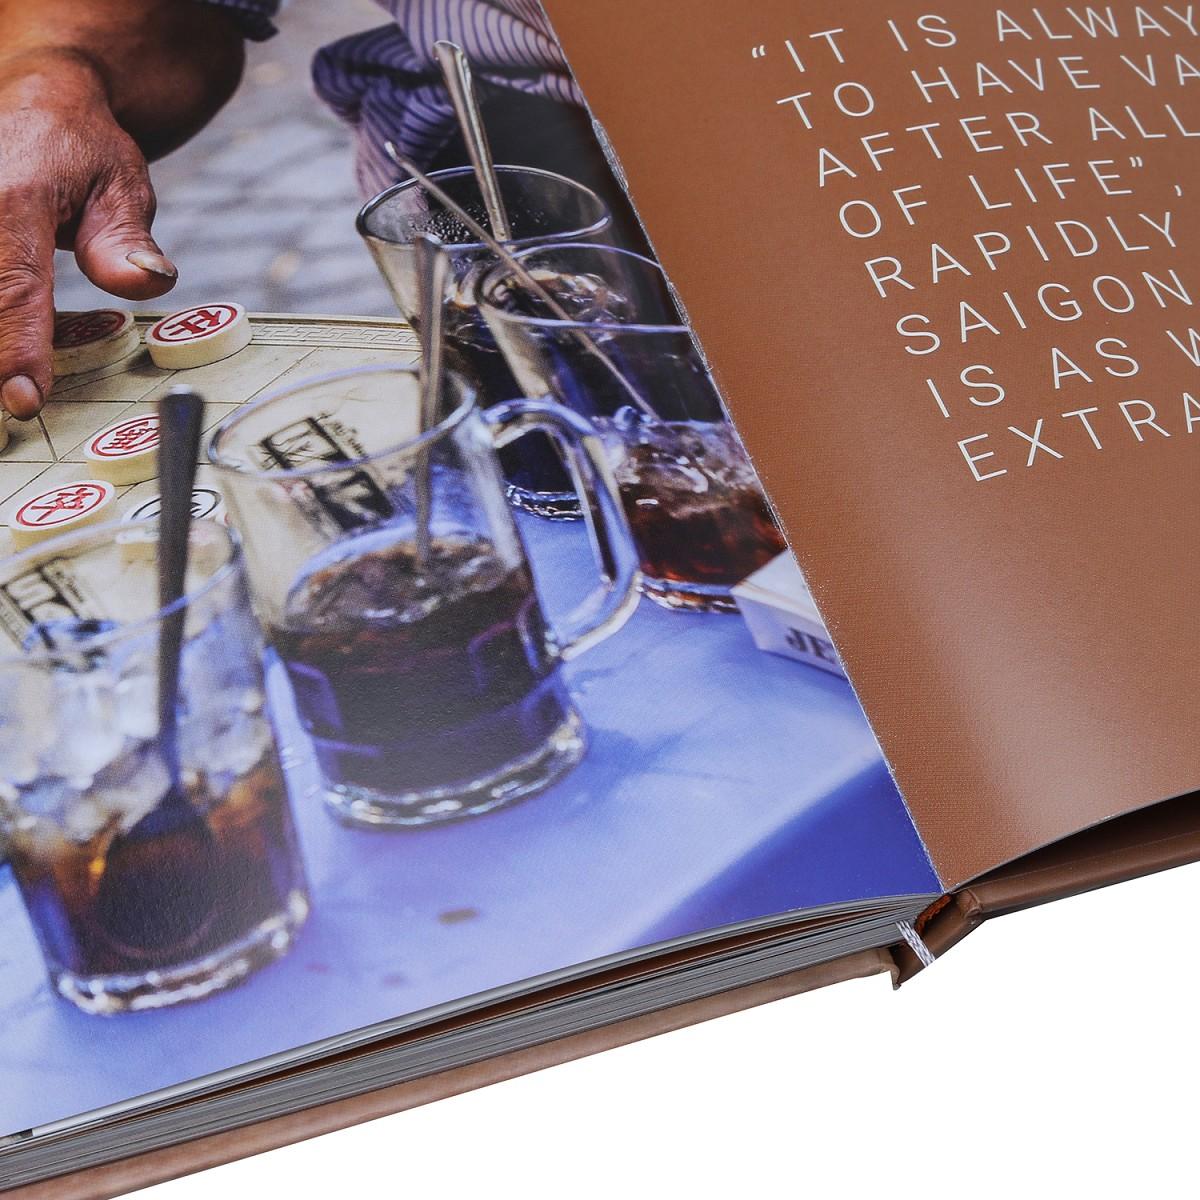 Sai Gon Cà Phê - A Glimpse Into SaiGon's Coffee Culture